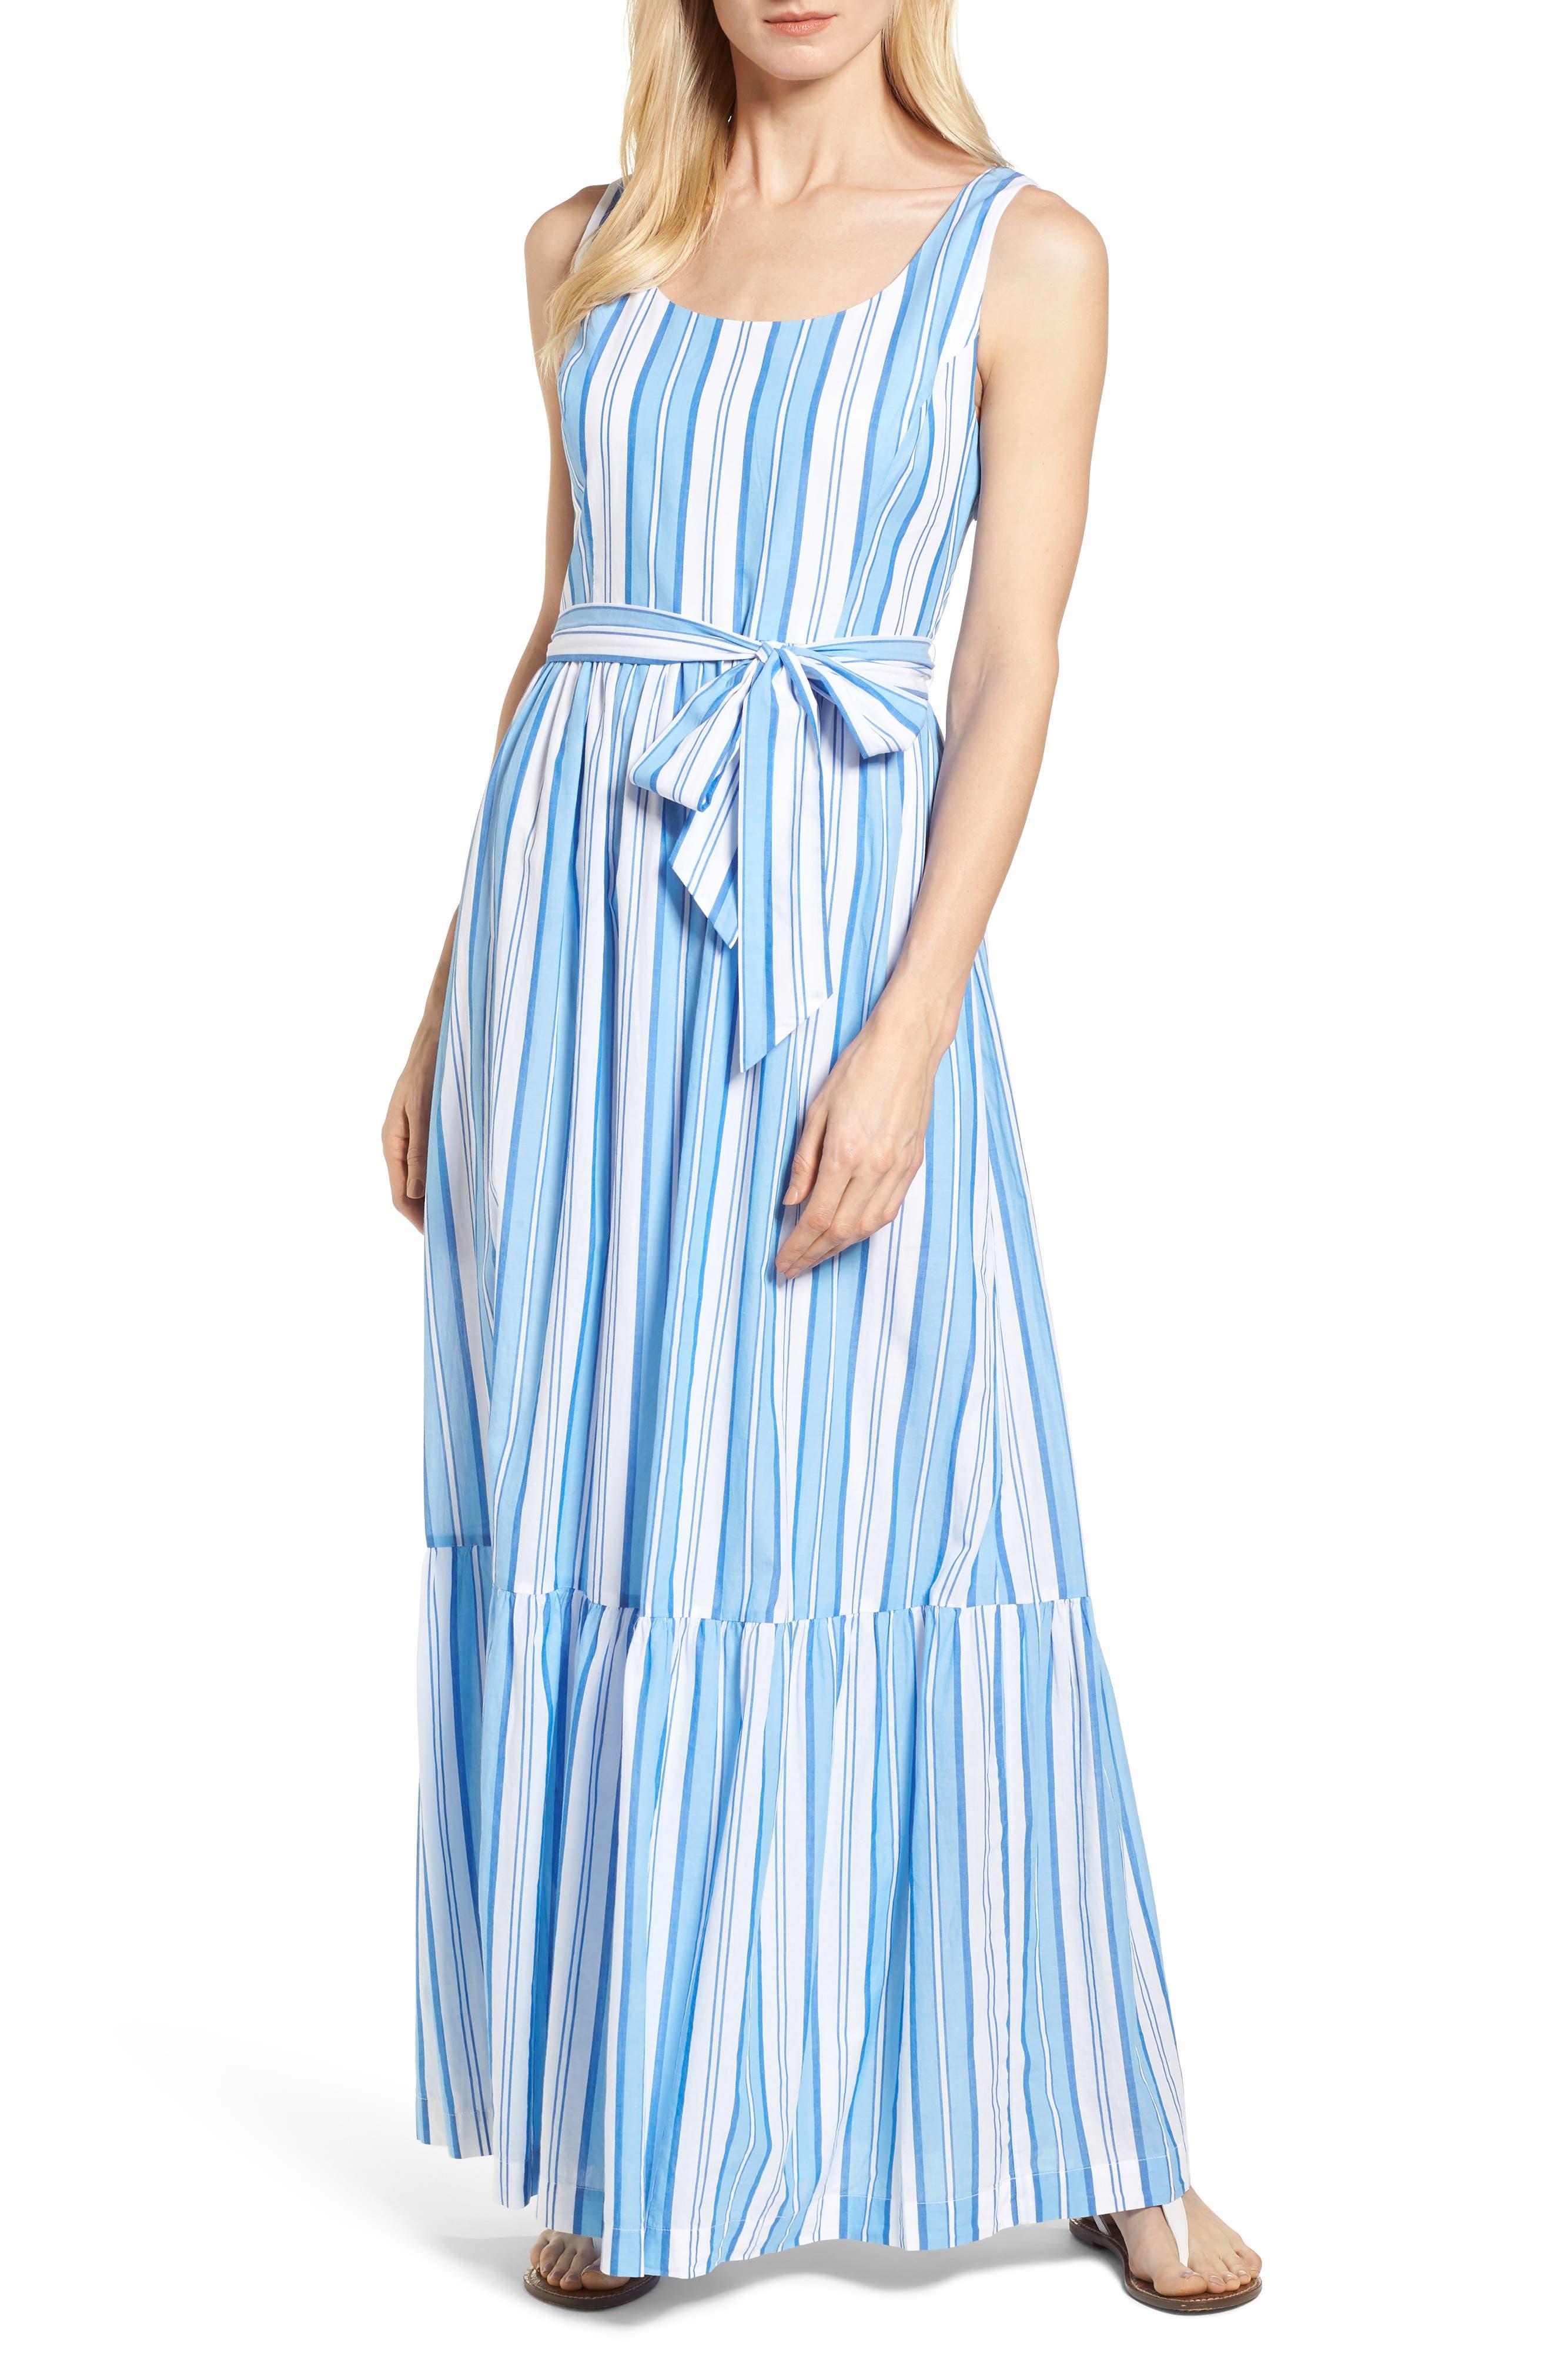 Ocean Stripe Tiered Maxi Dress,                             Main thumbnail 1, color,                             Blue Jay